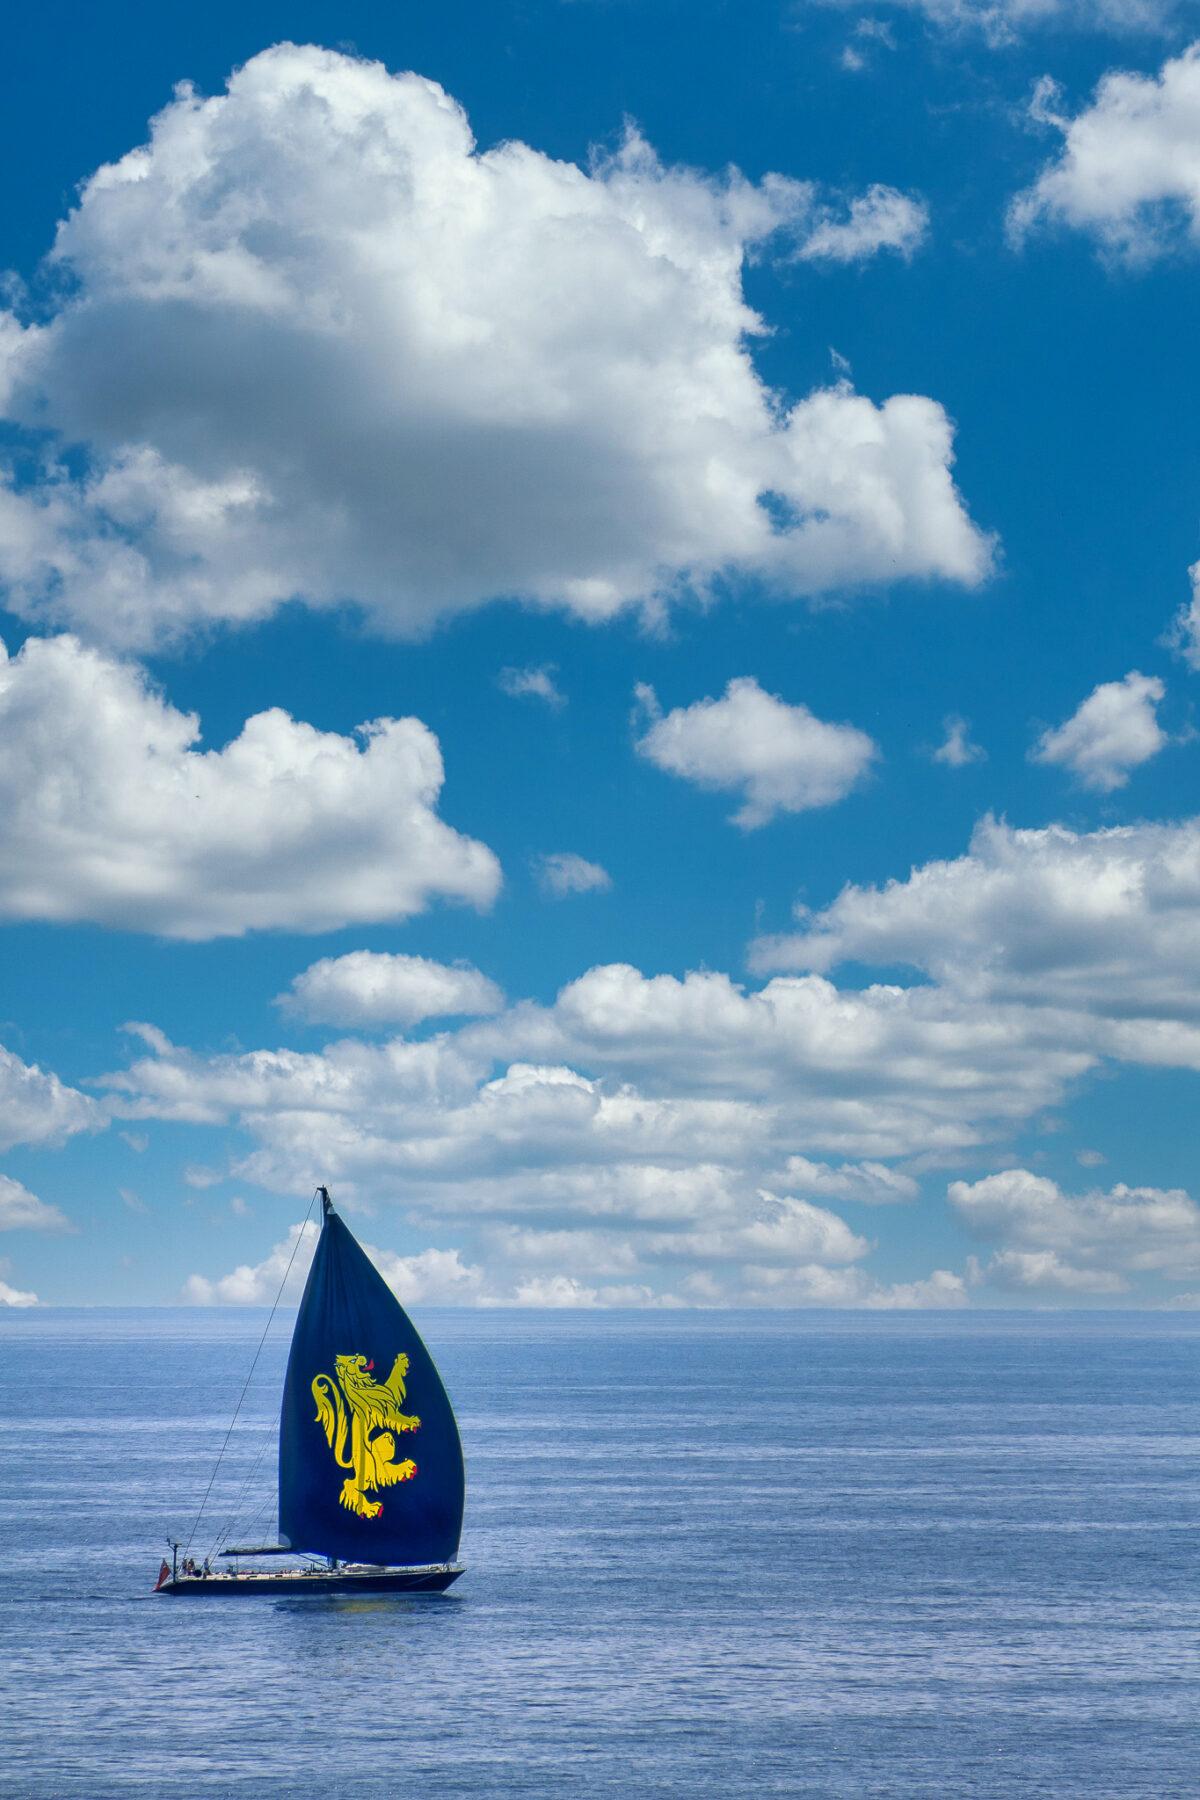 sail away II - Segelboot - (c) Eric immerheiser